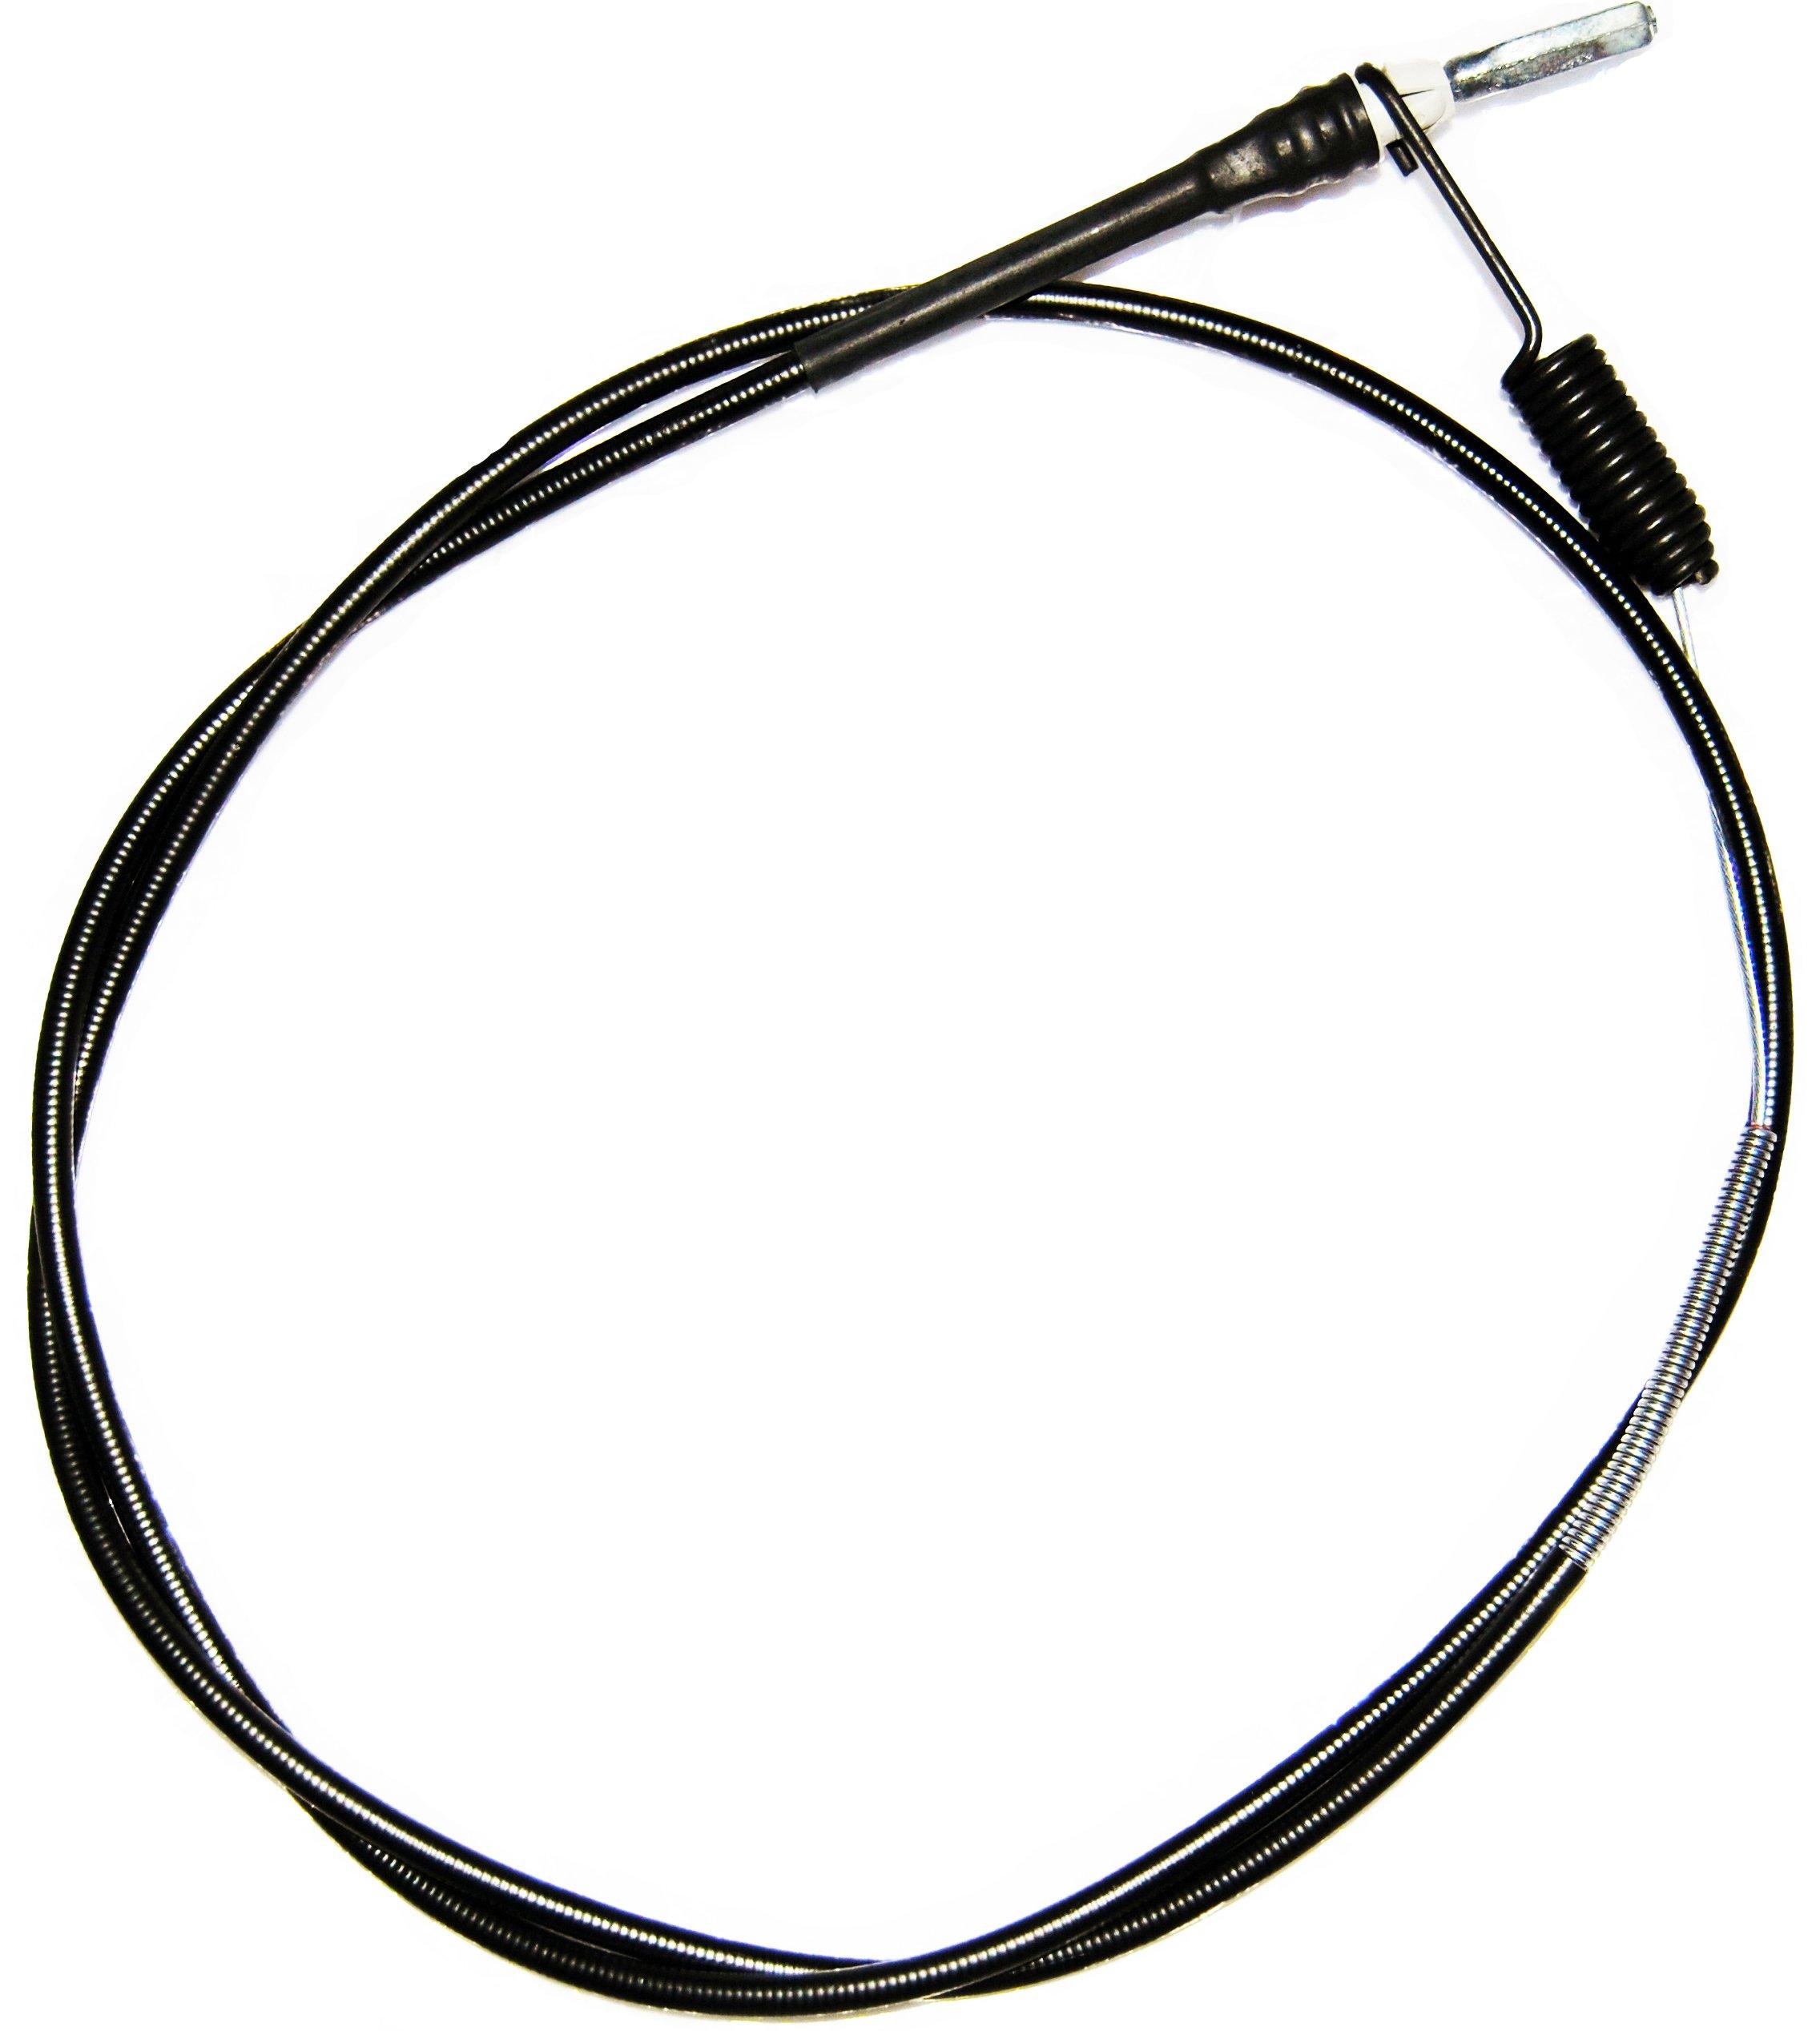 54510-VG4-C01 Genuine Honda OEM Lawn Mower Clutch/Drive/Self Cable for HRR216, HRT216, HRZ216